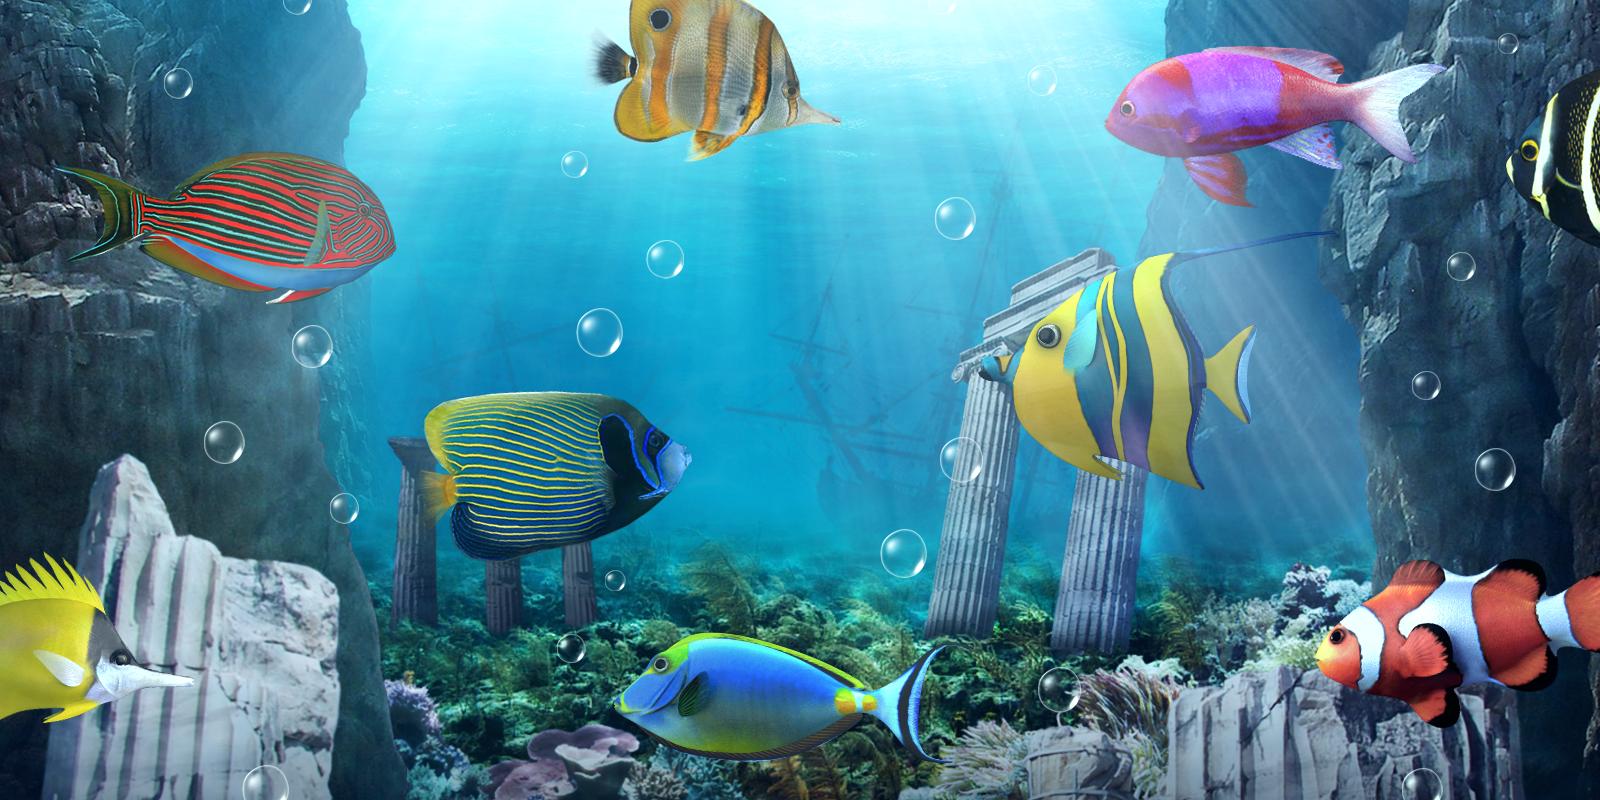 Fish Tank 3d Live Wallpaper For Pc Akvarium Levende Tapet Android Apps P 229 Google Play